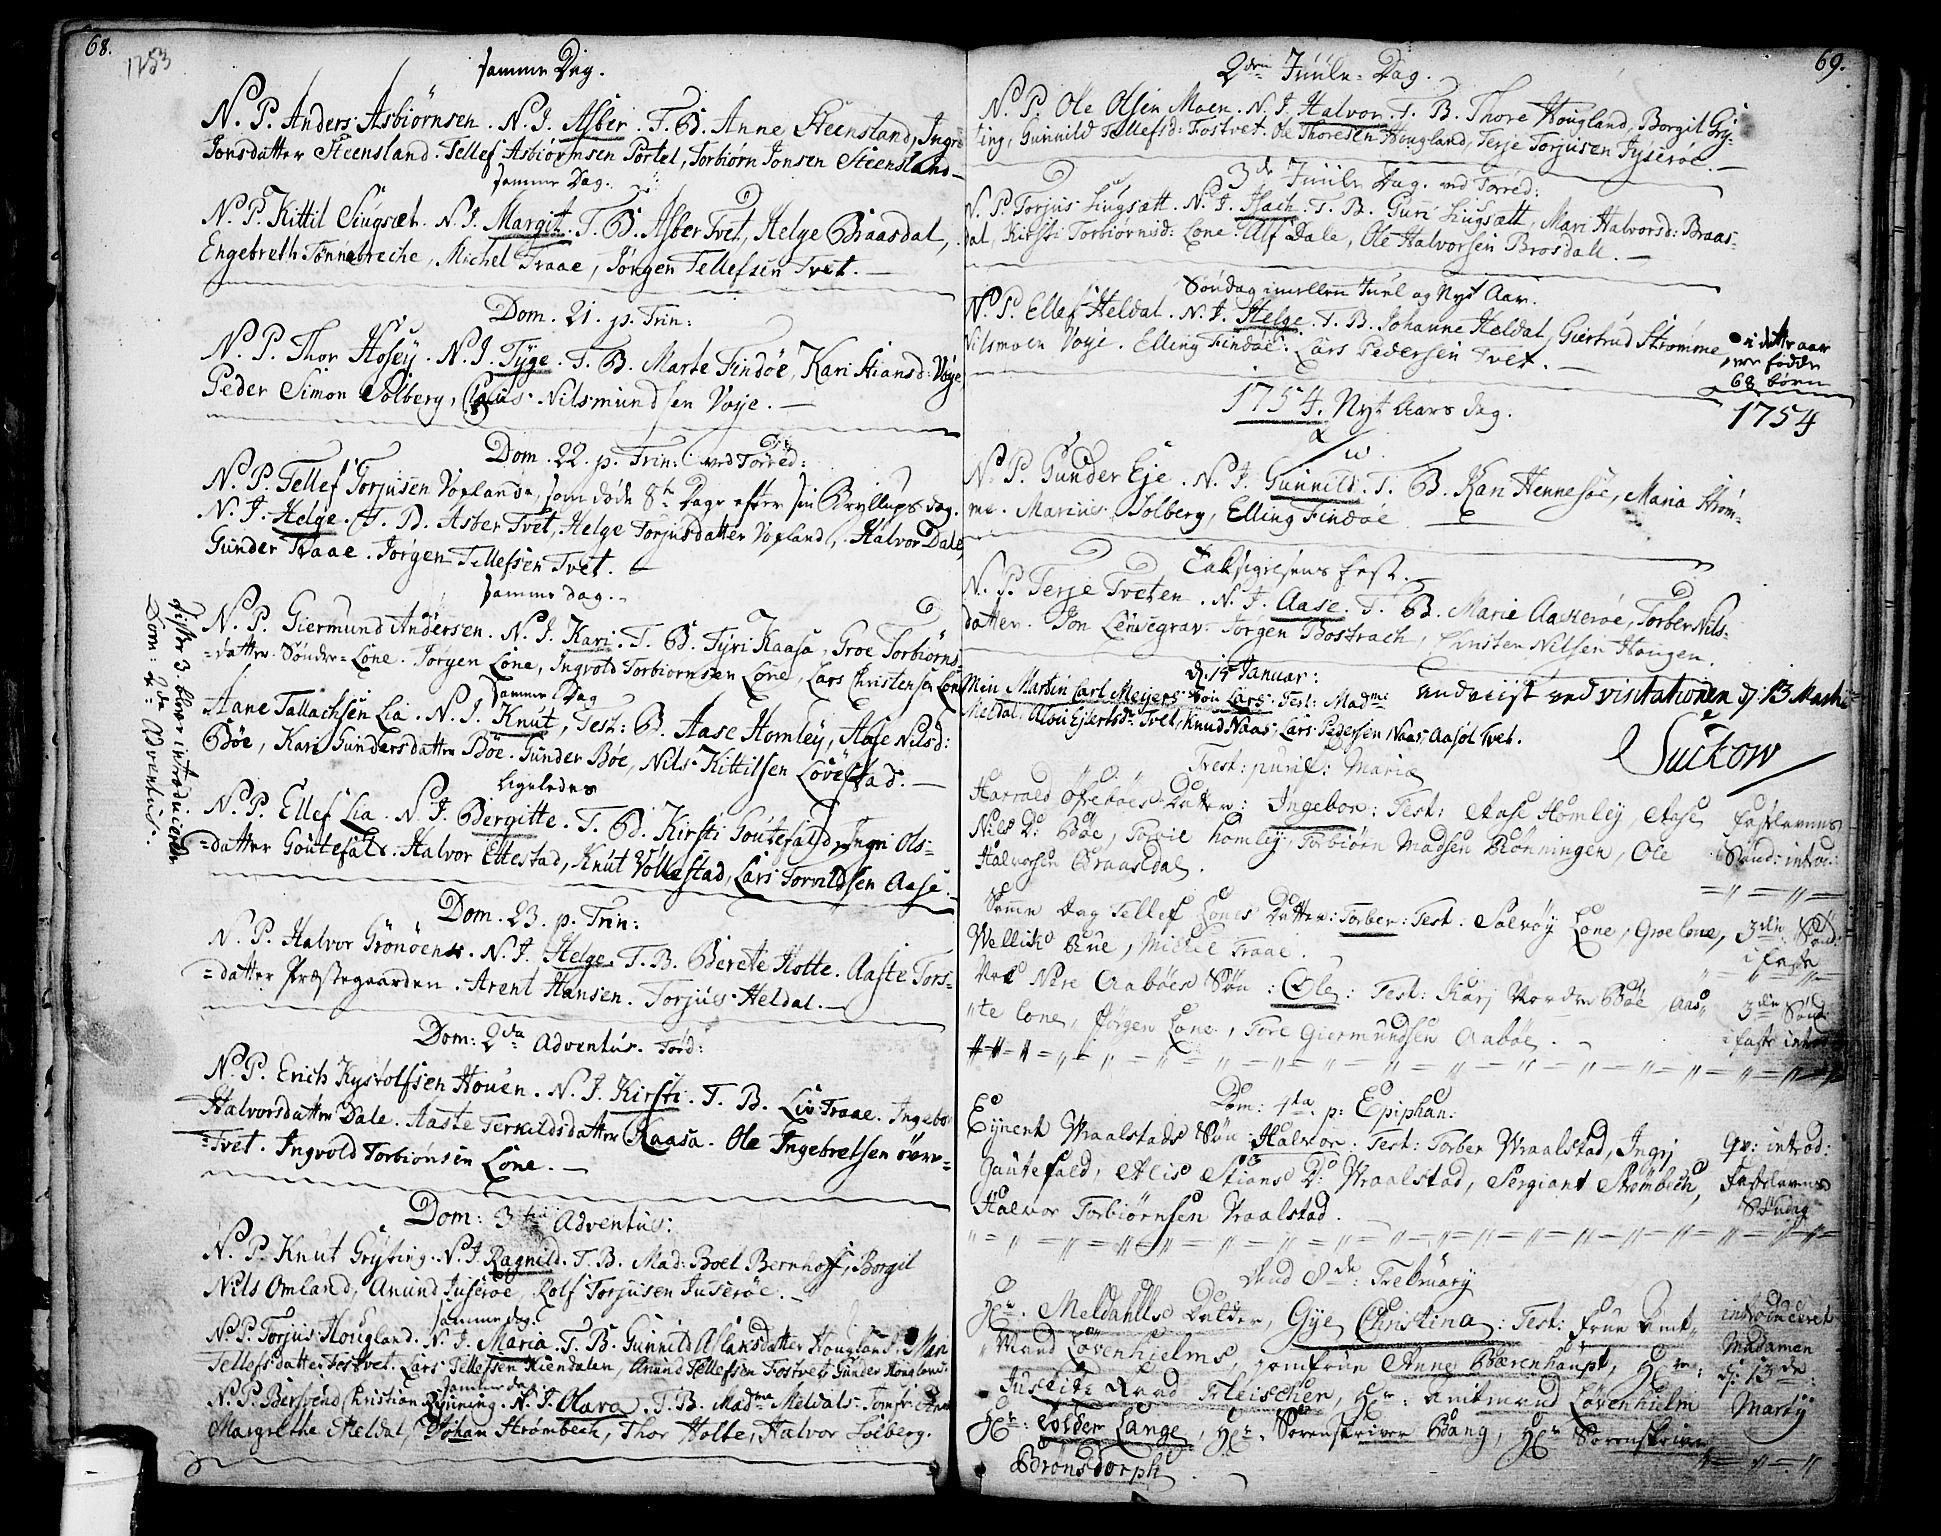 SAKO, Drangedal kirkebøker, F/Fa/L0001: Ministerialbok nr. 1, 1697-1767, s. 68-69